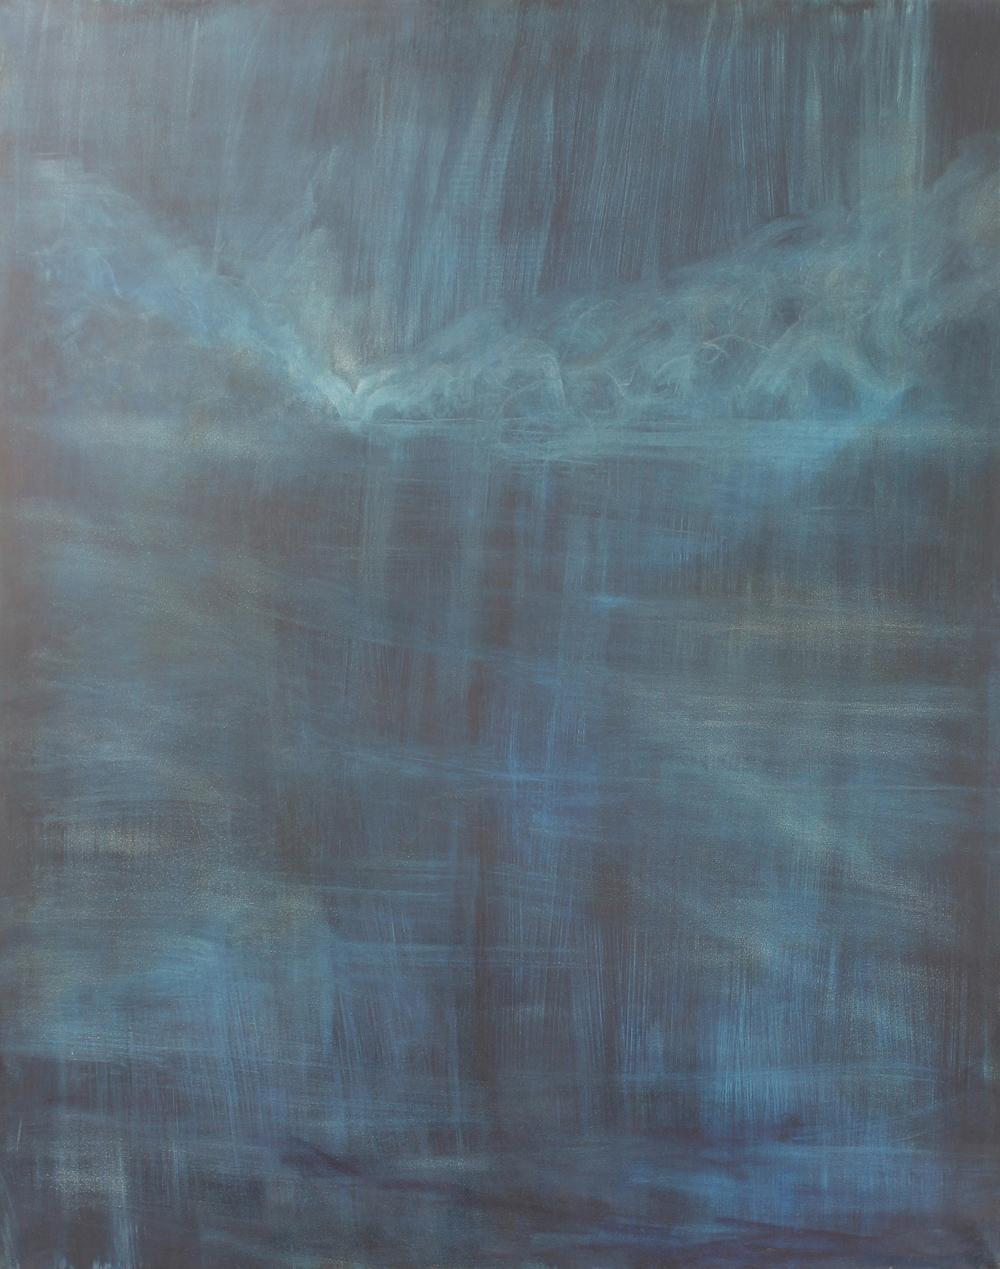 Sleepwalker, 2014, oil on canvas, 150 x 120cm